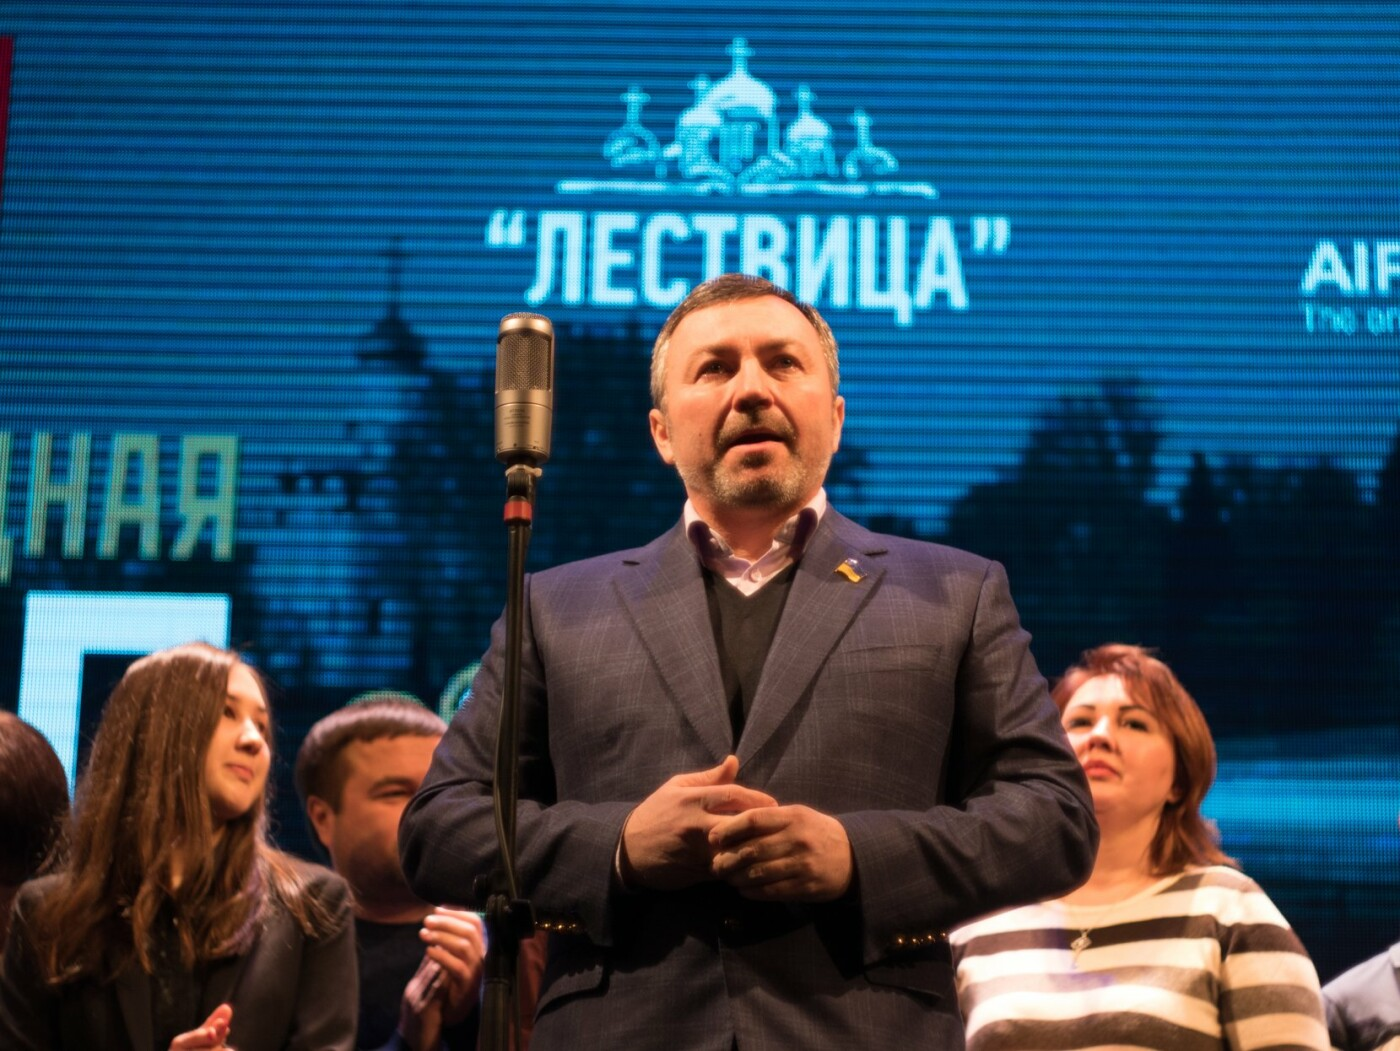 Киноассамблея на Днепре-2018: как прошла церемония открытия кинофорума (ФОТО), фото-13